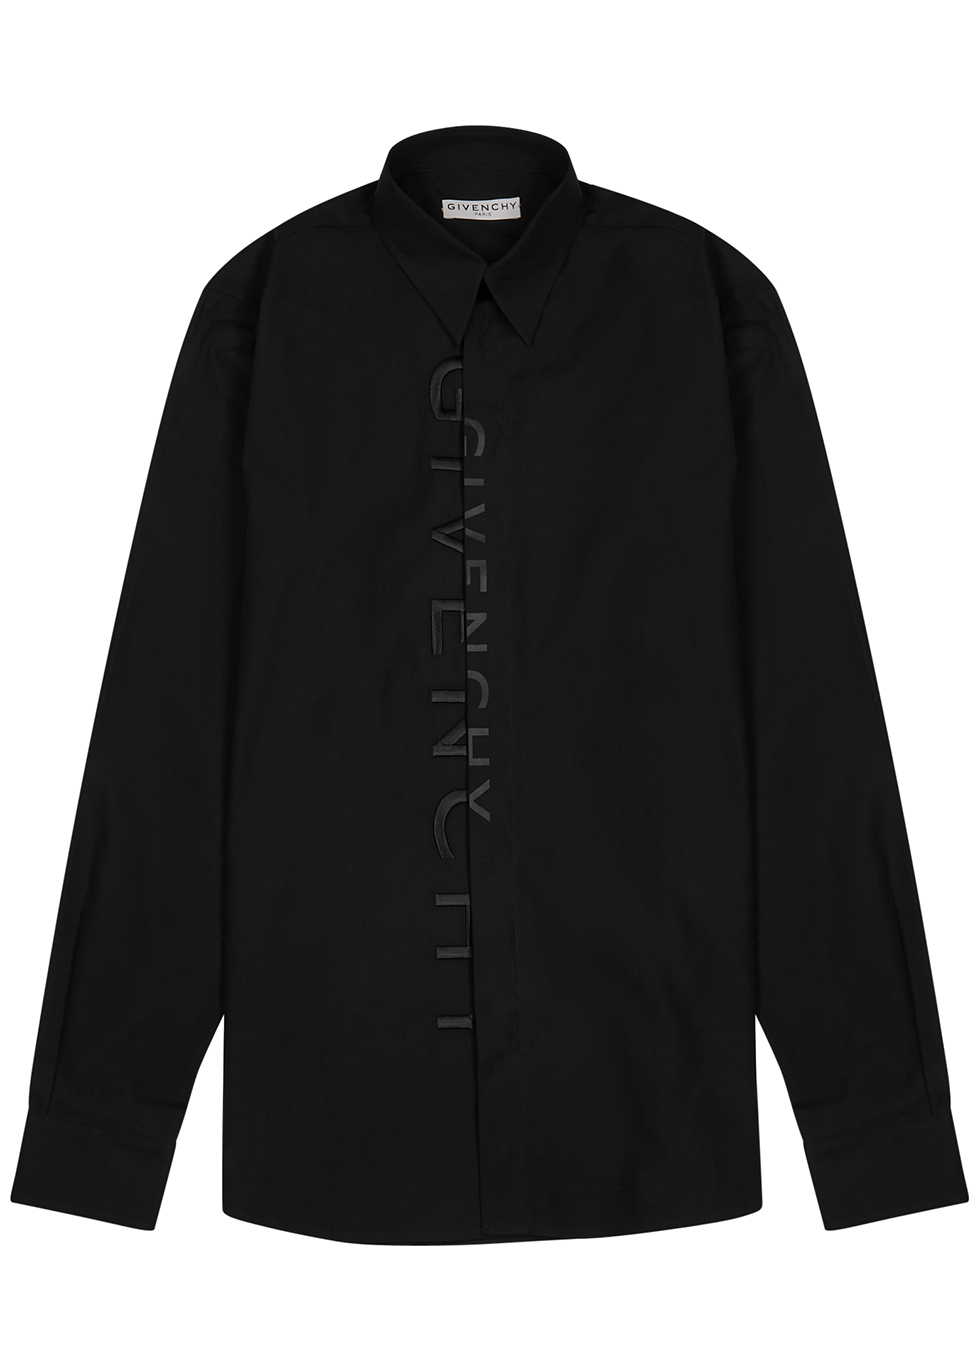 Black logo-embroidered cotton shirt